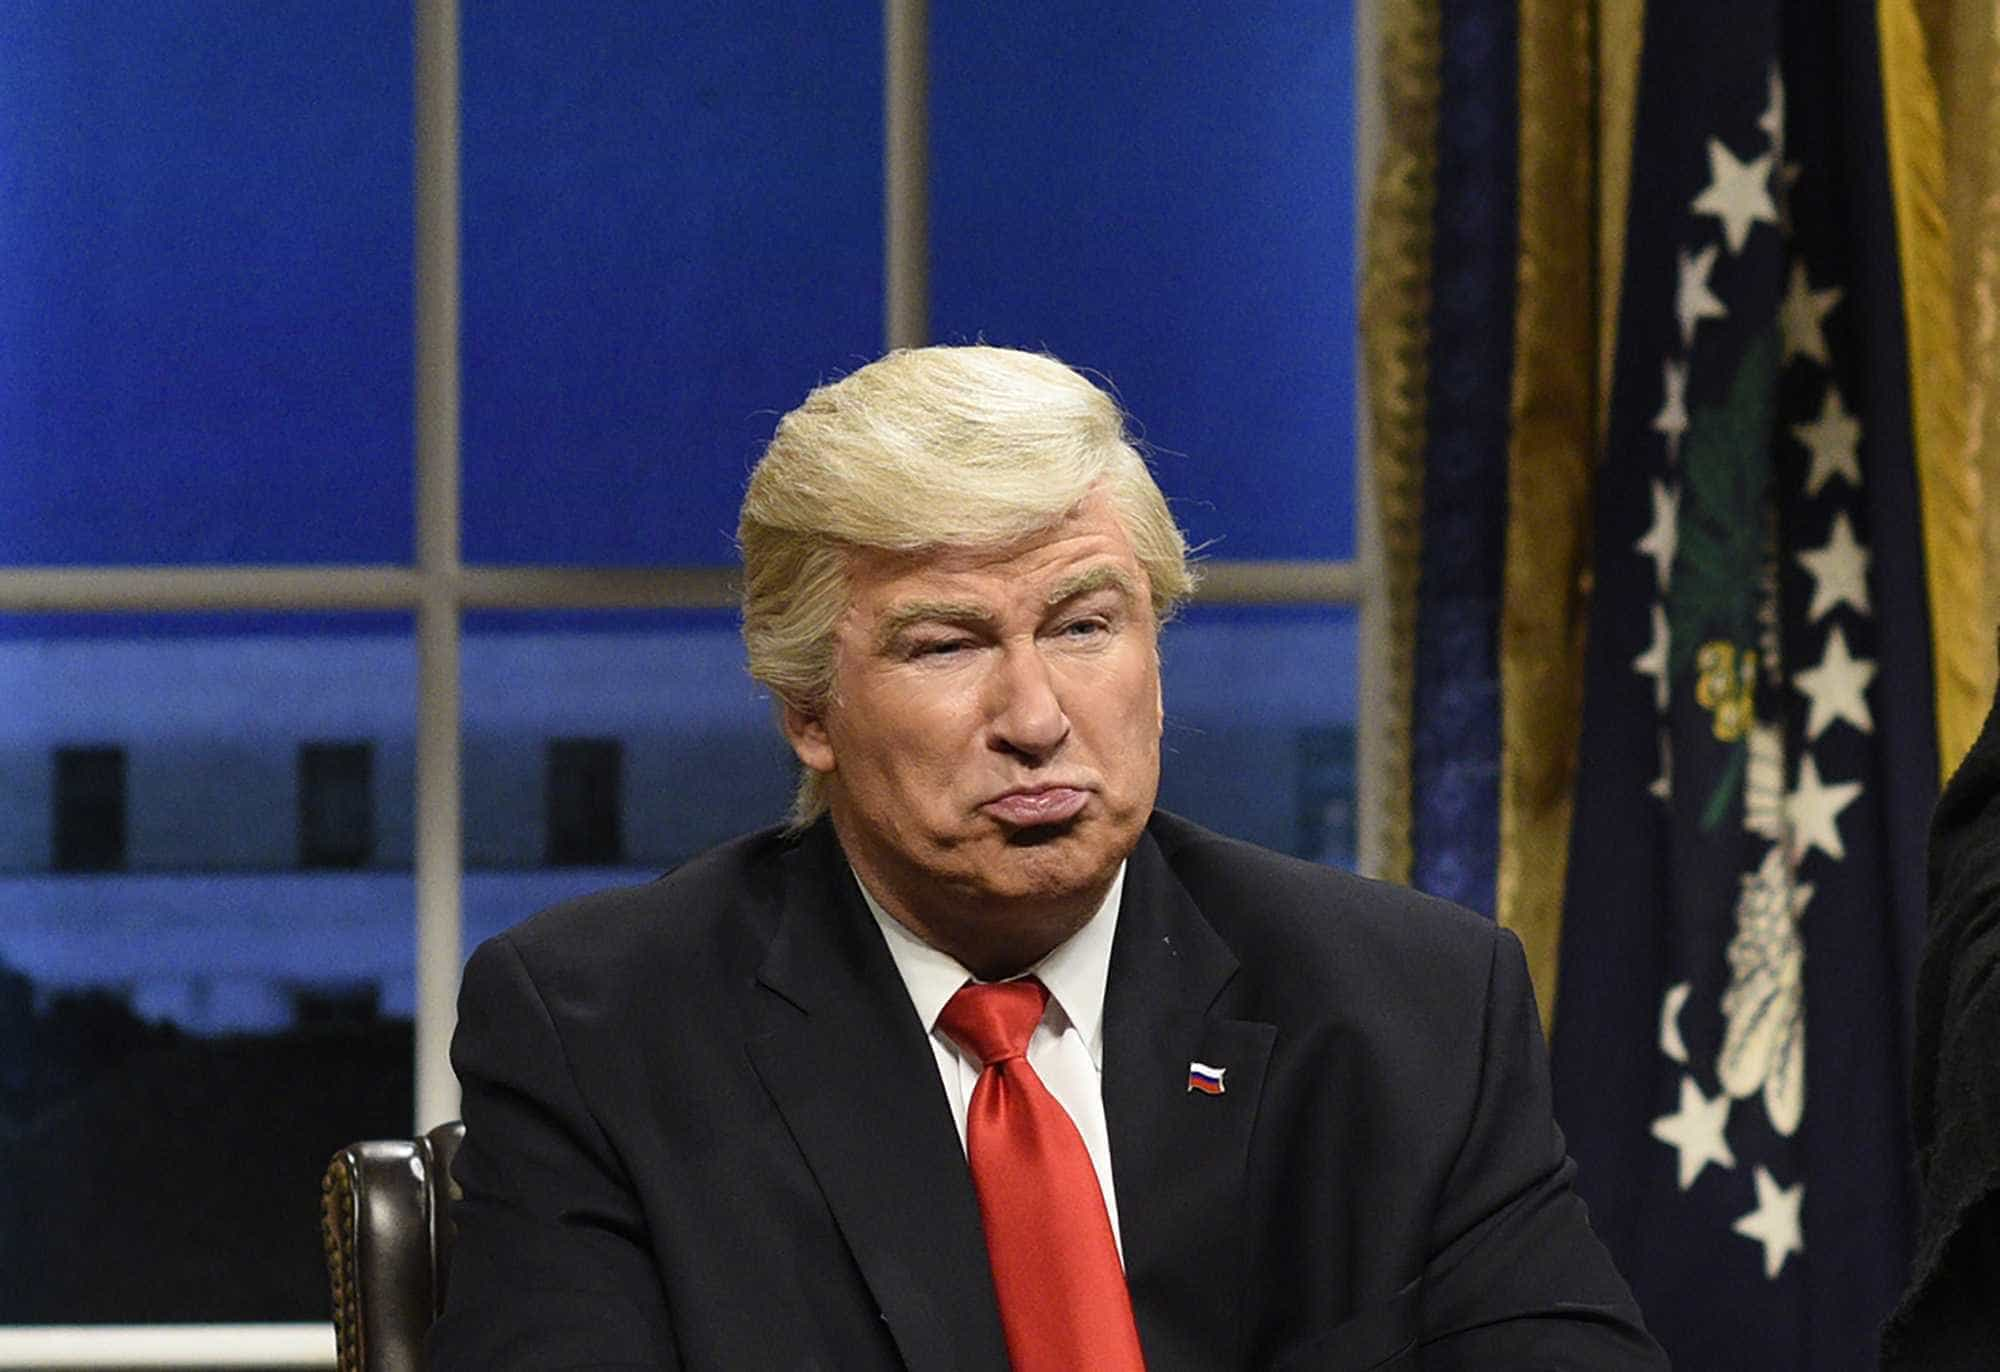 Trumpchama paródia deBaldwin de medíocre e ator rebate